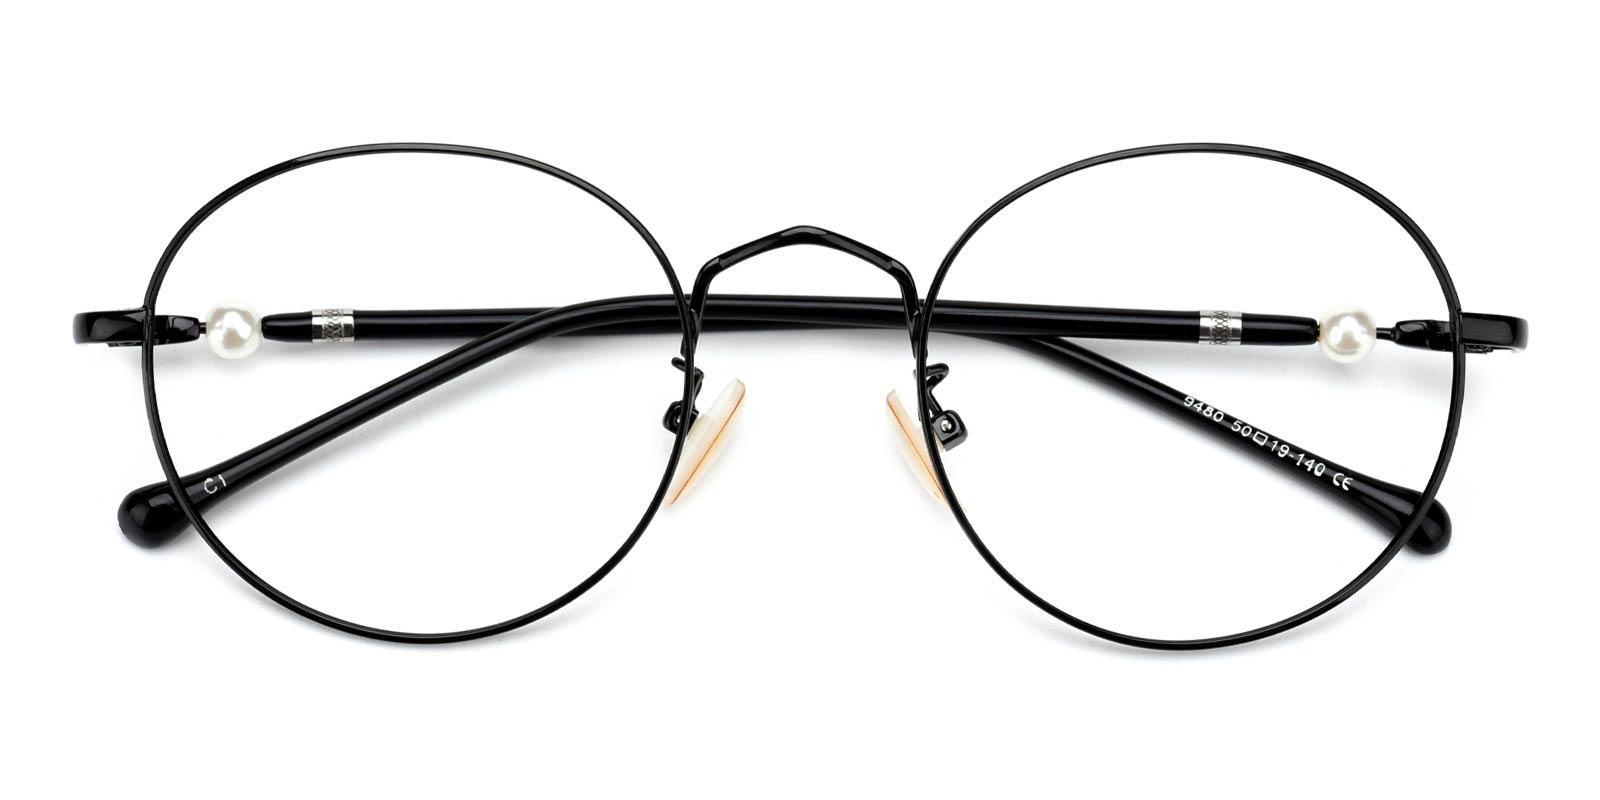 Oswego-Black-Round-Metal-Eyeglasses-detail